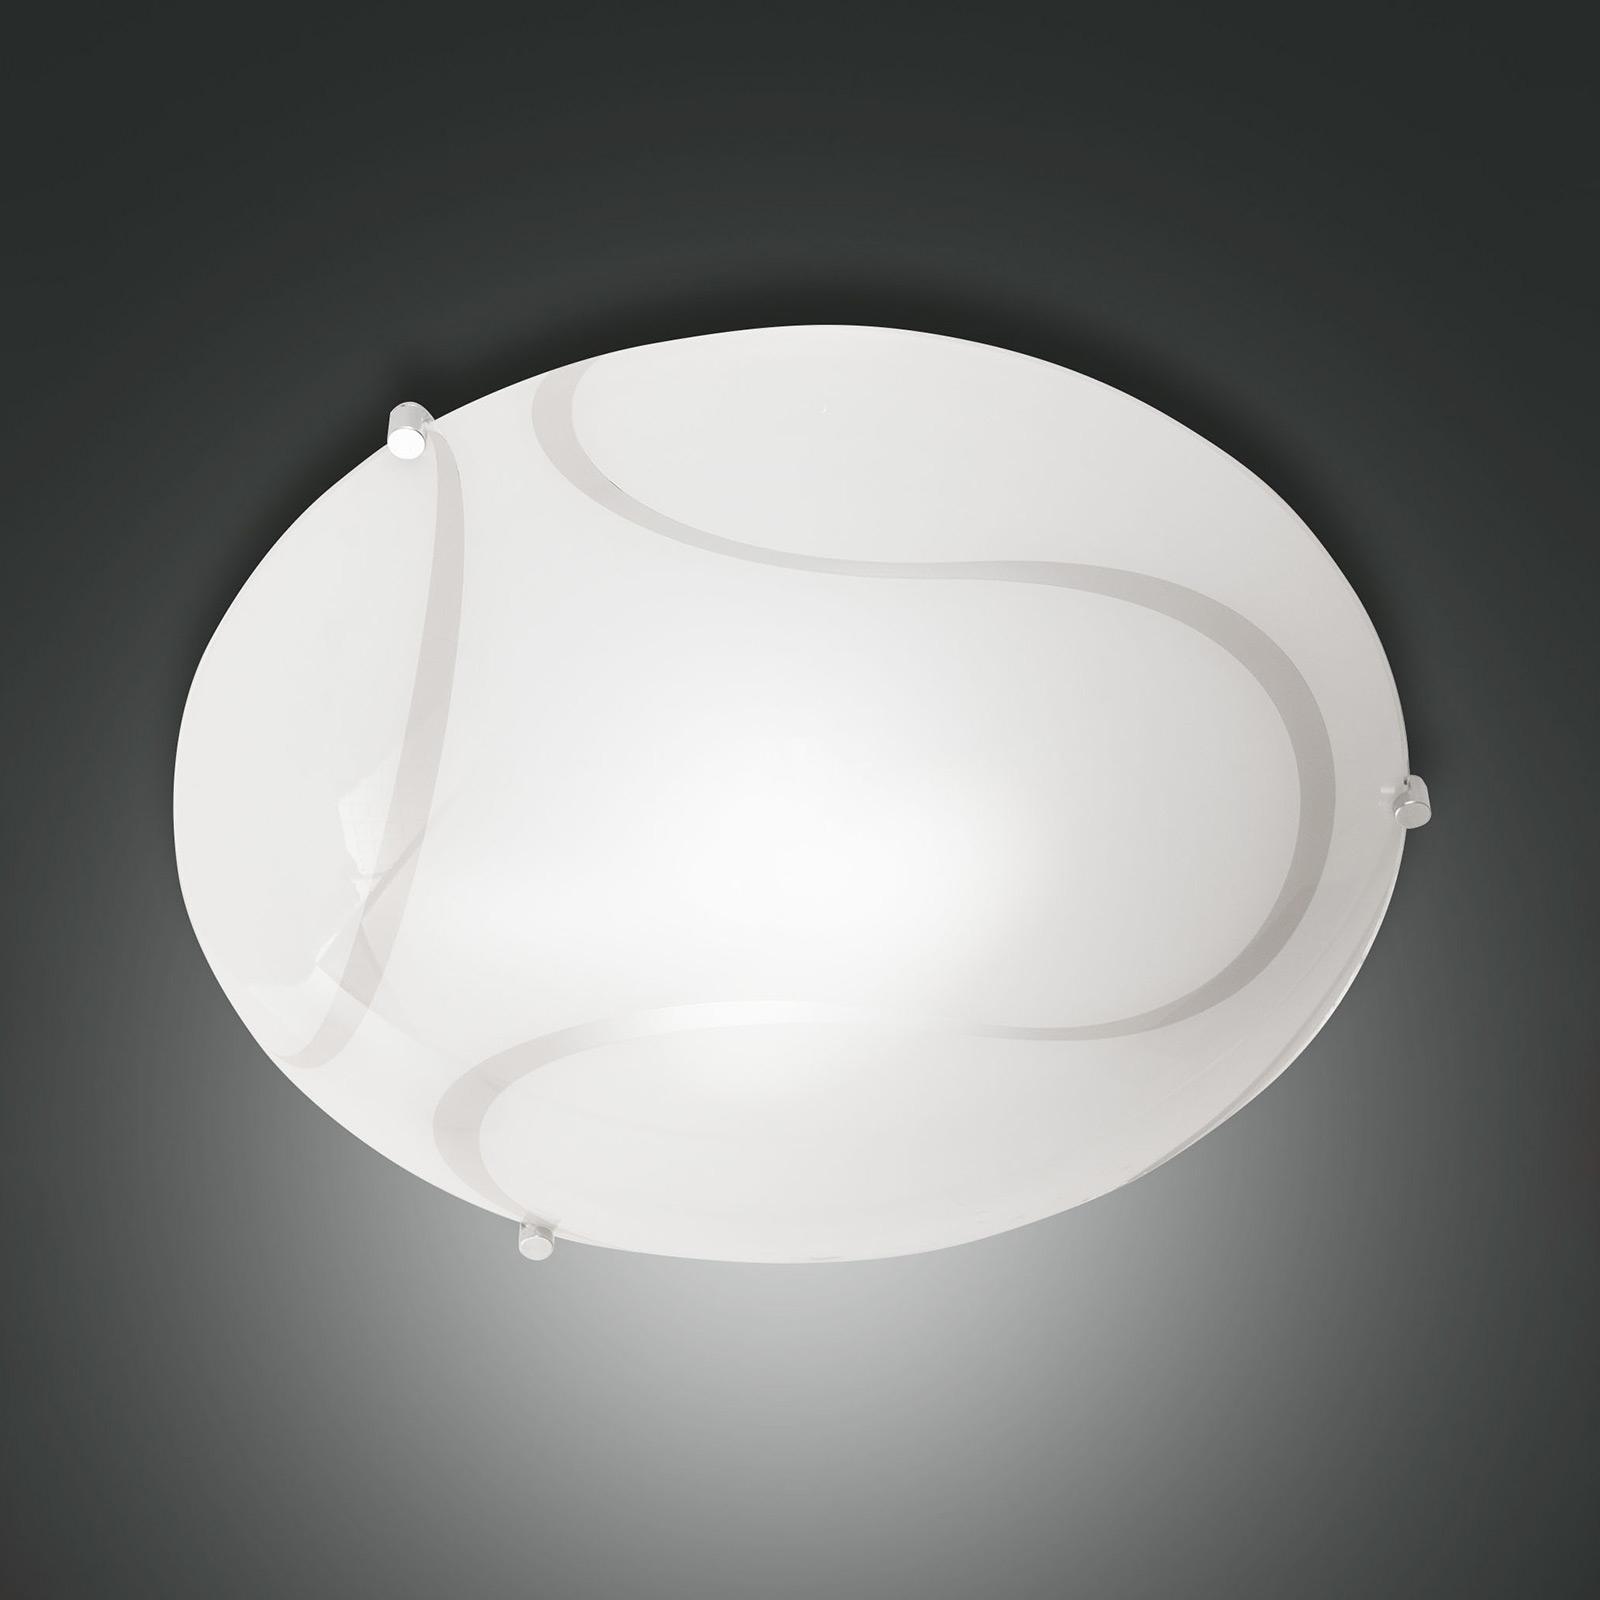 Lampa sufitowa Magma ze szkła, 30 cm